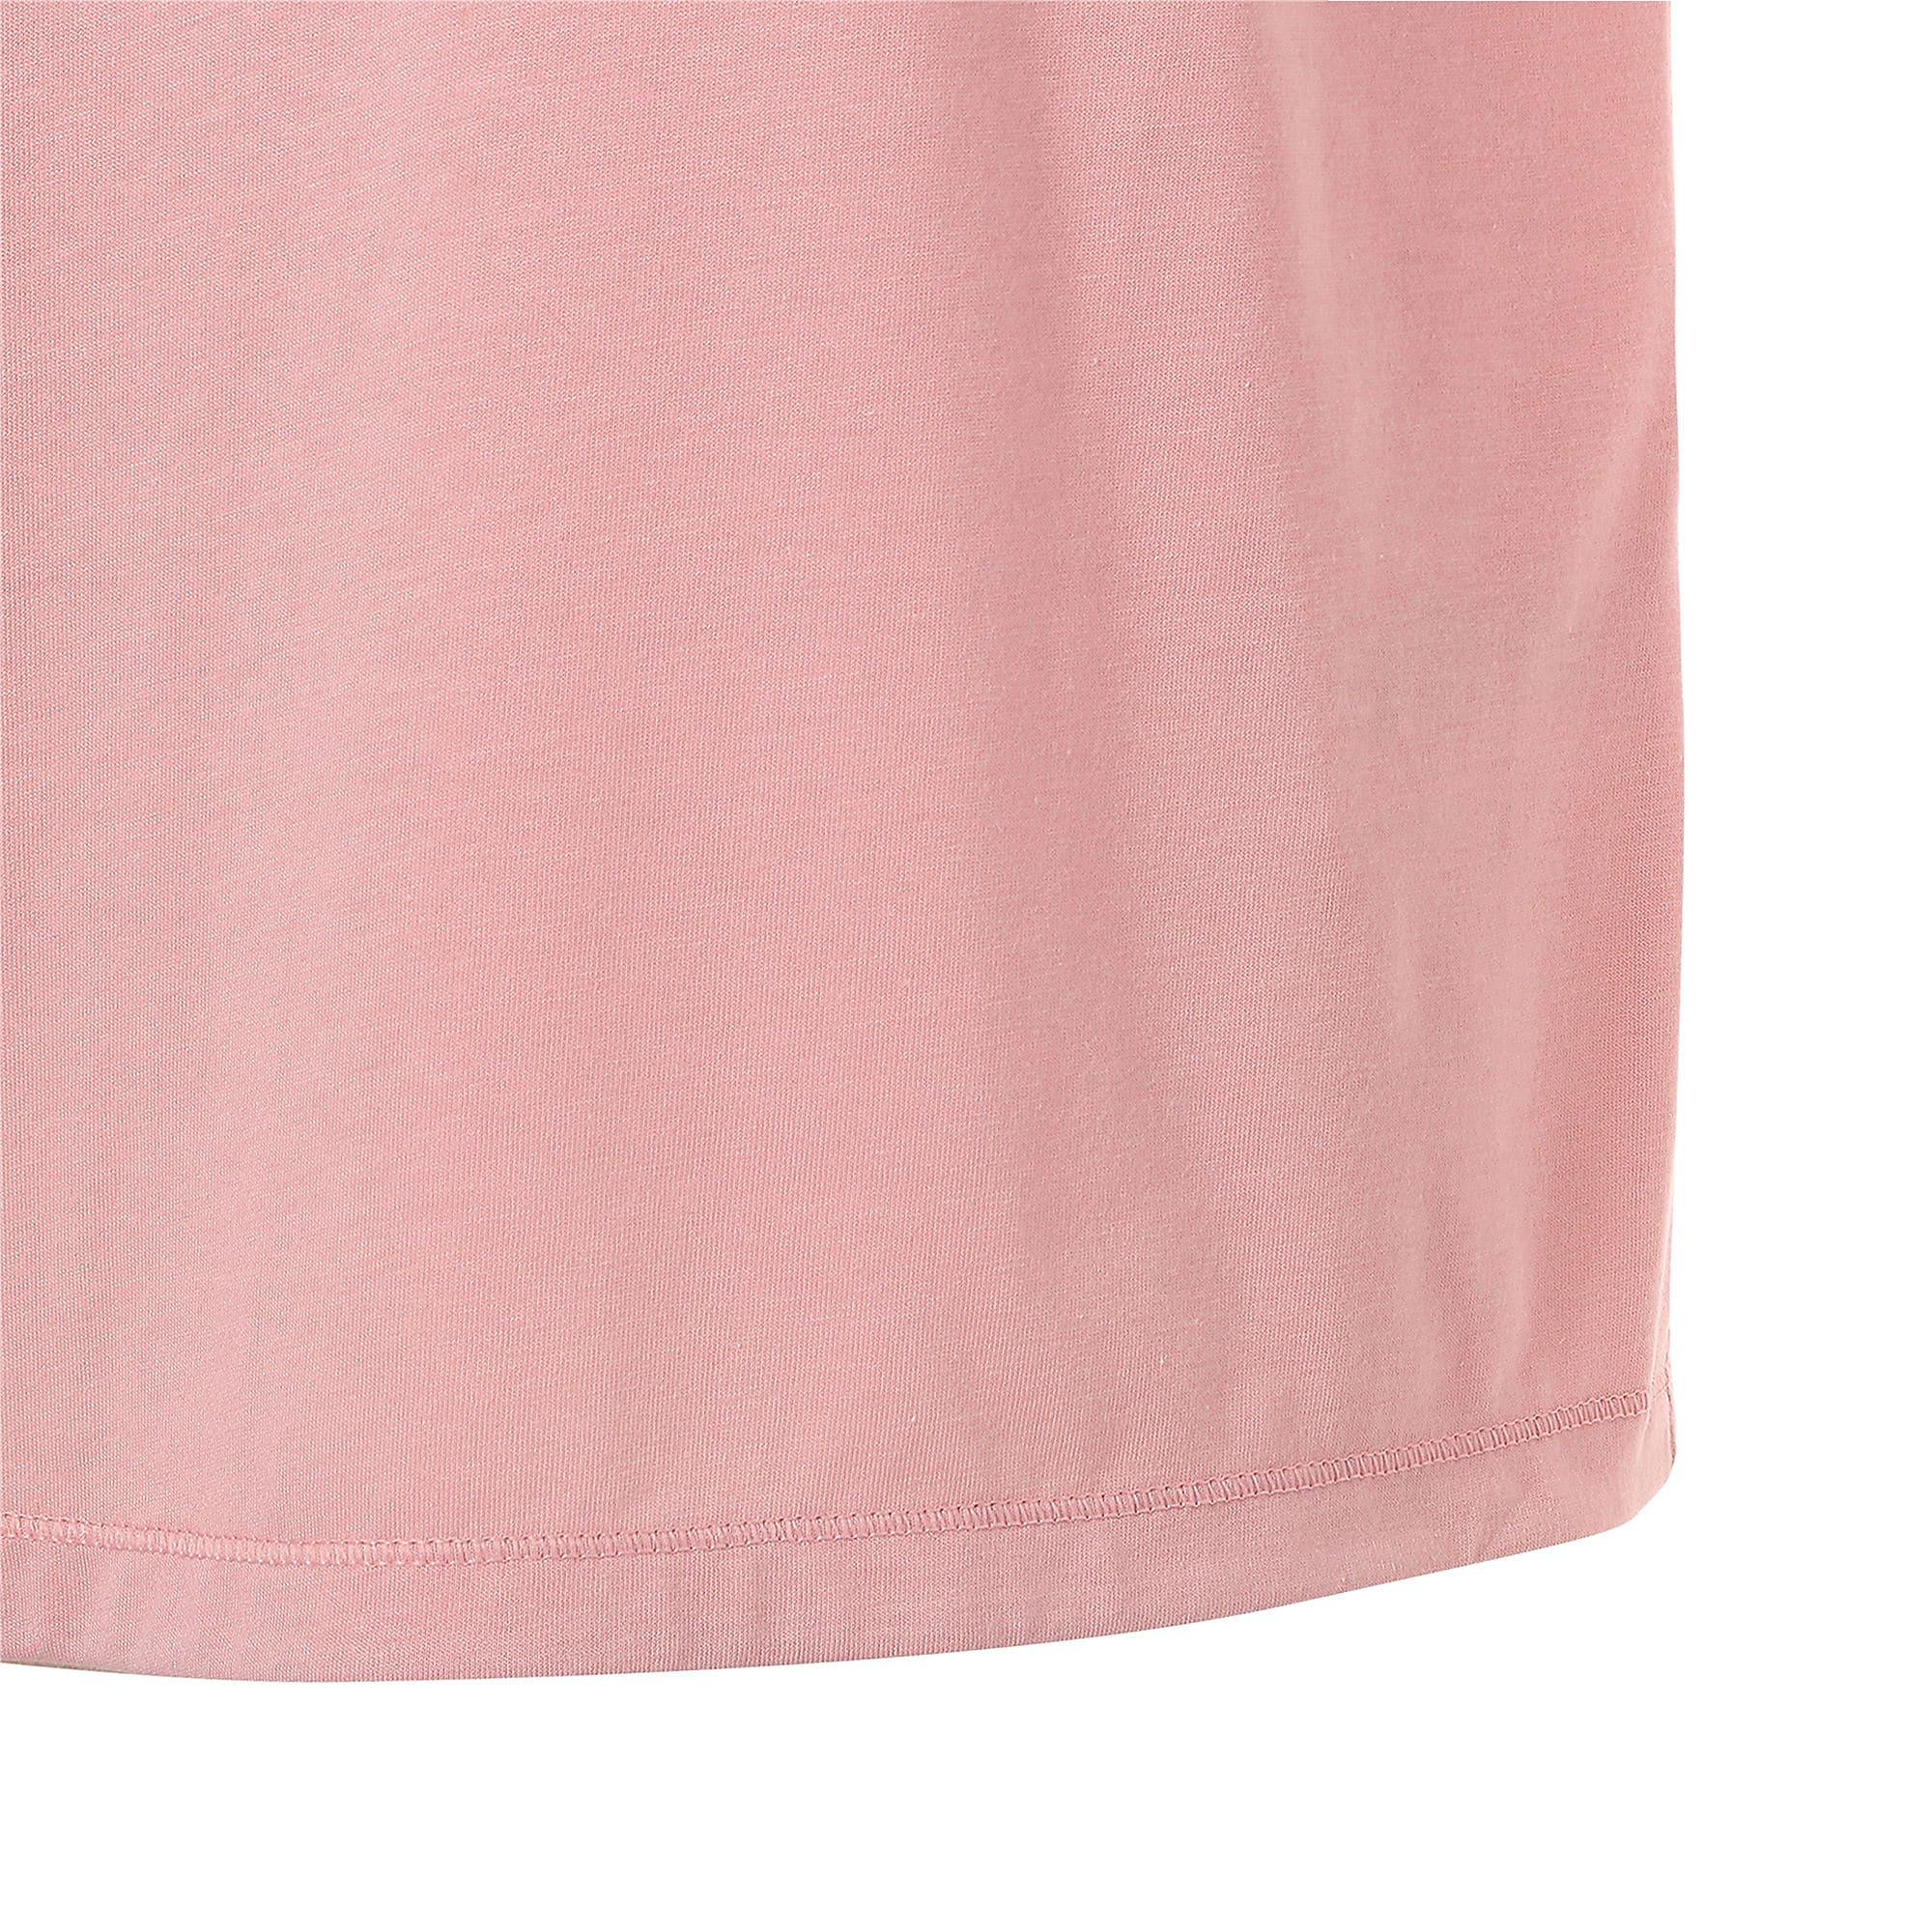 Thumbnail 9 of FAVORITE キャット SS ウィメンズ トレーニング Tシャツ 半袖, Bridal Rose, medium-JPN